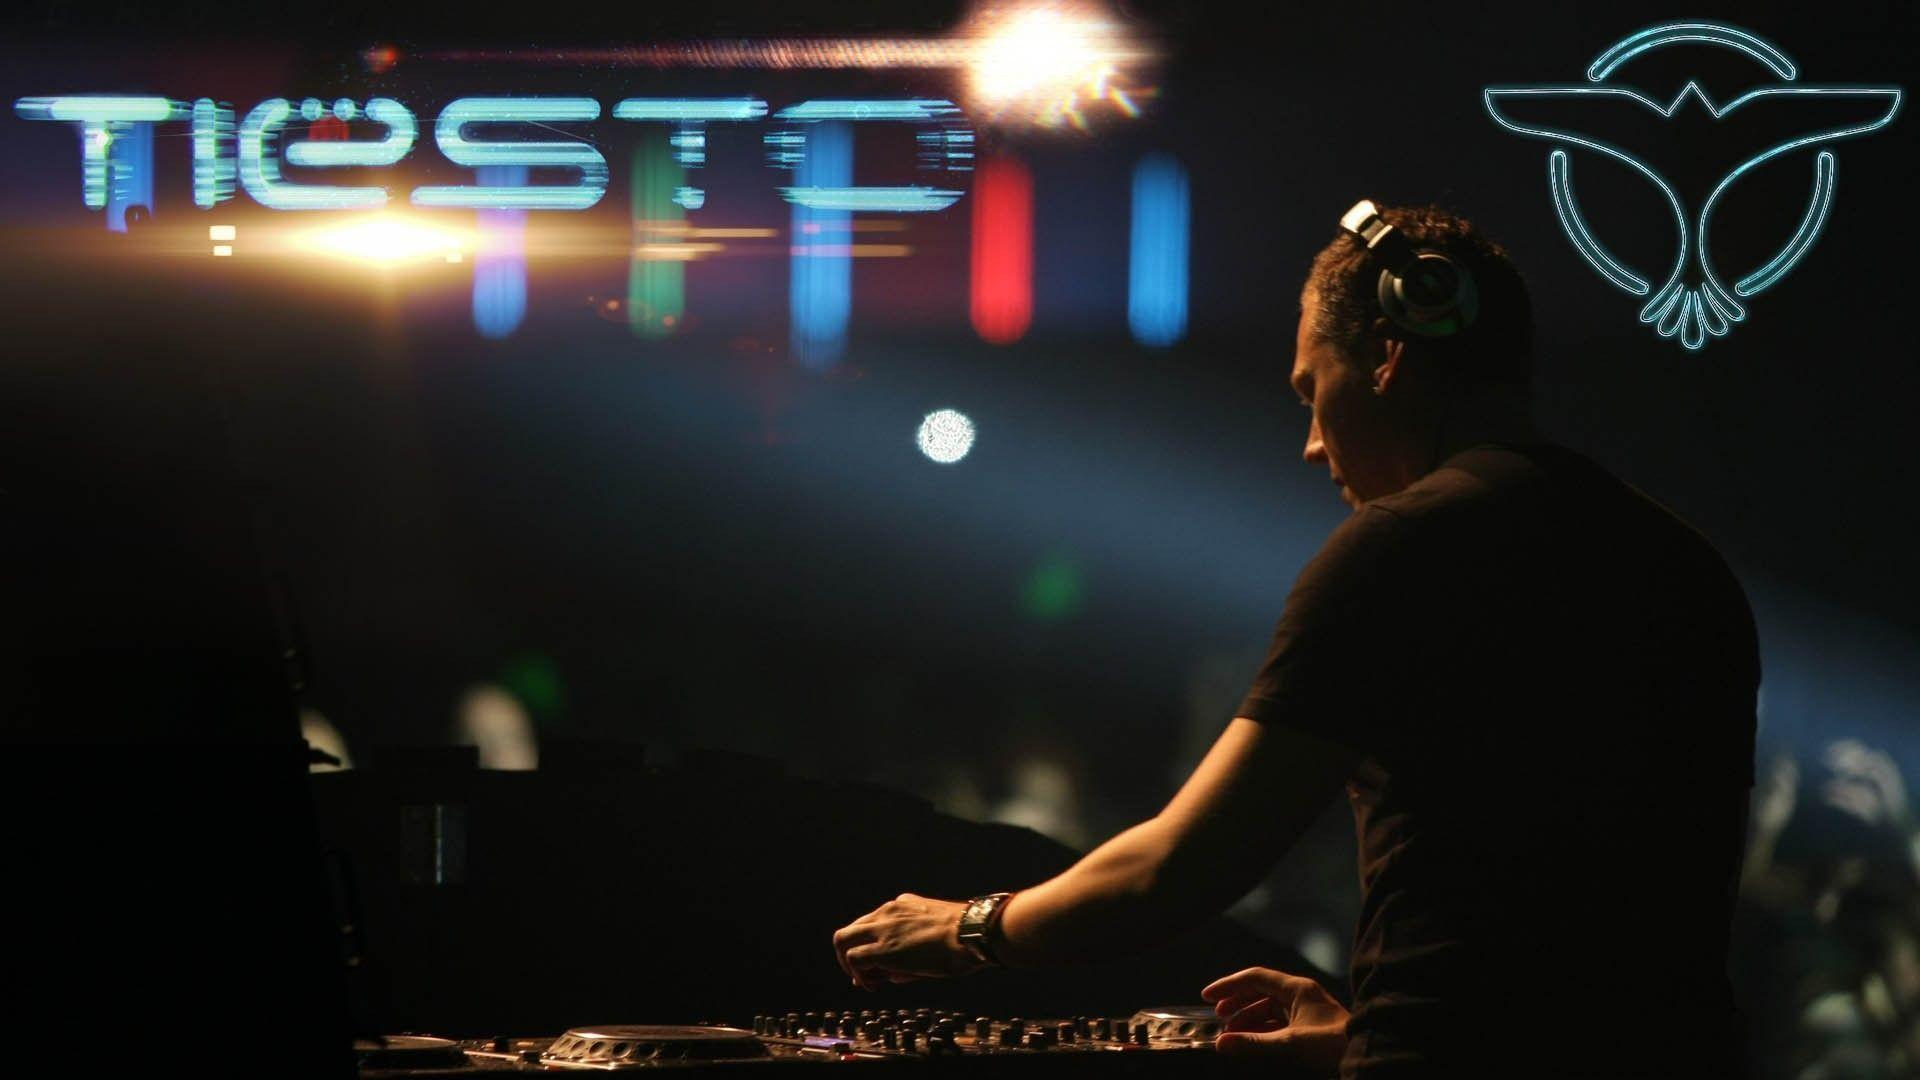 DJ Tiesto Wallpapers 2015 - Wallpaper - 94.4KB